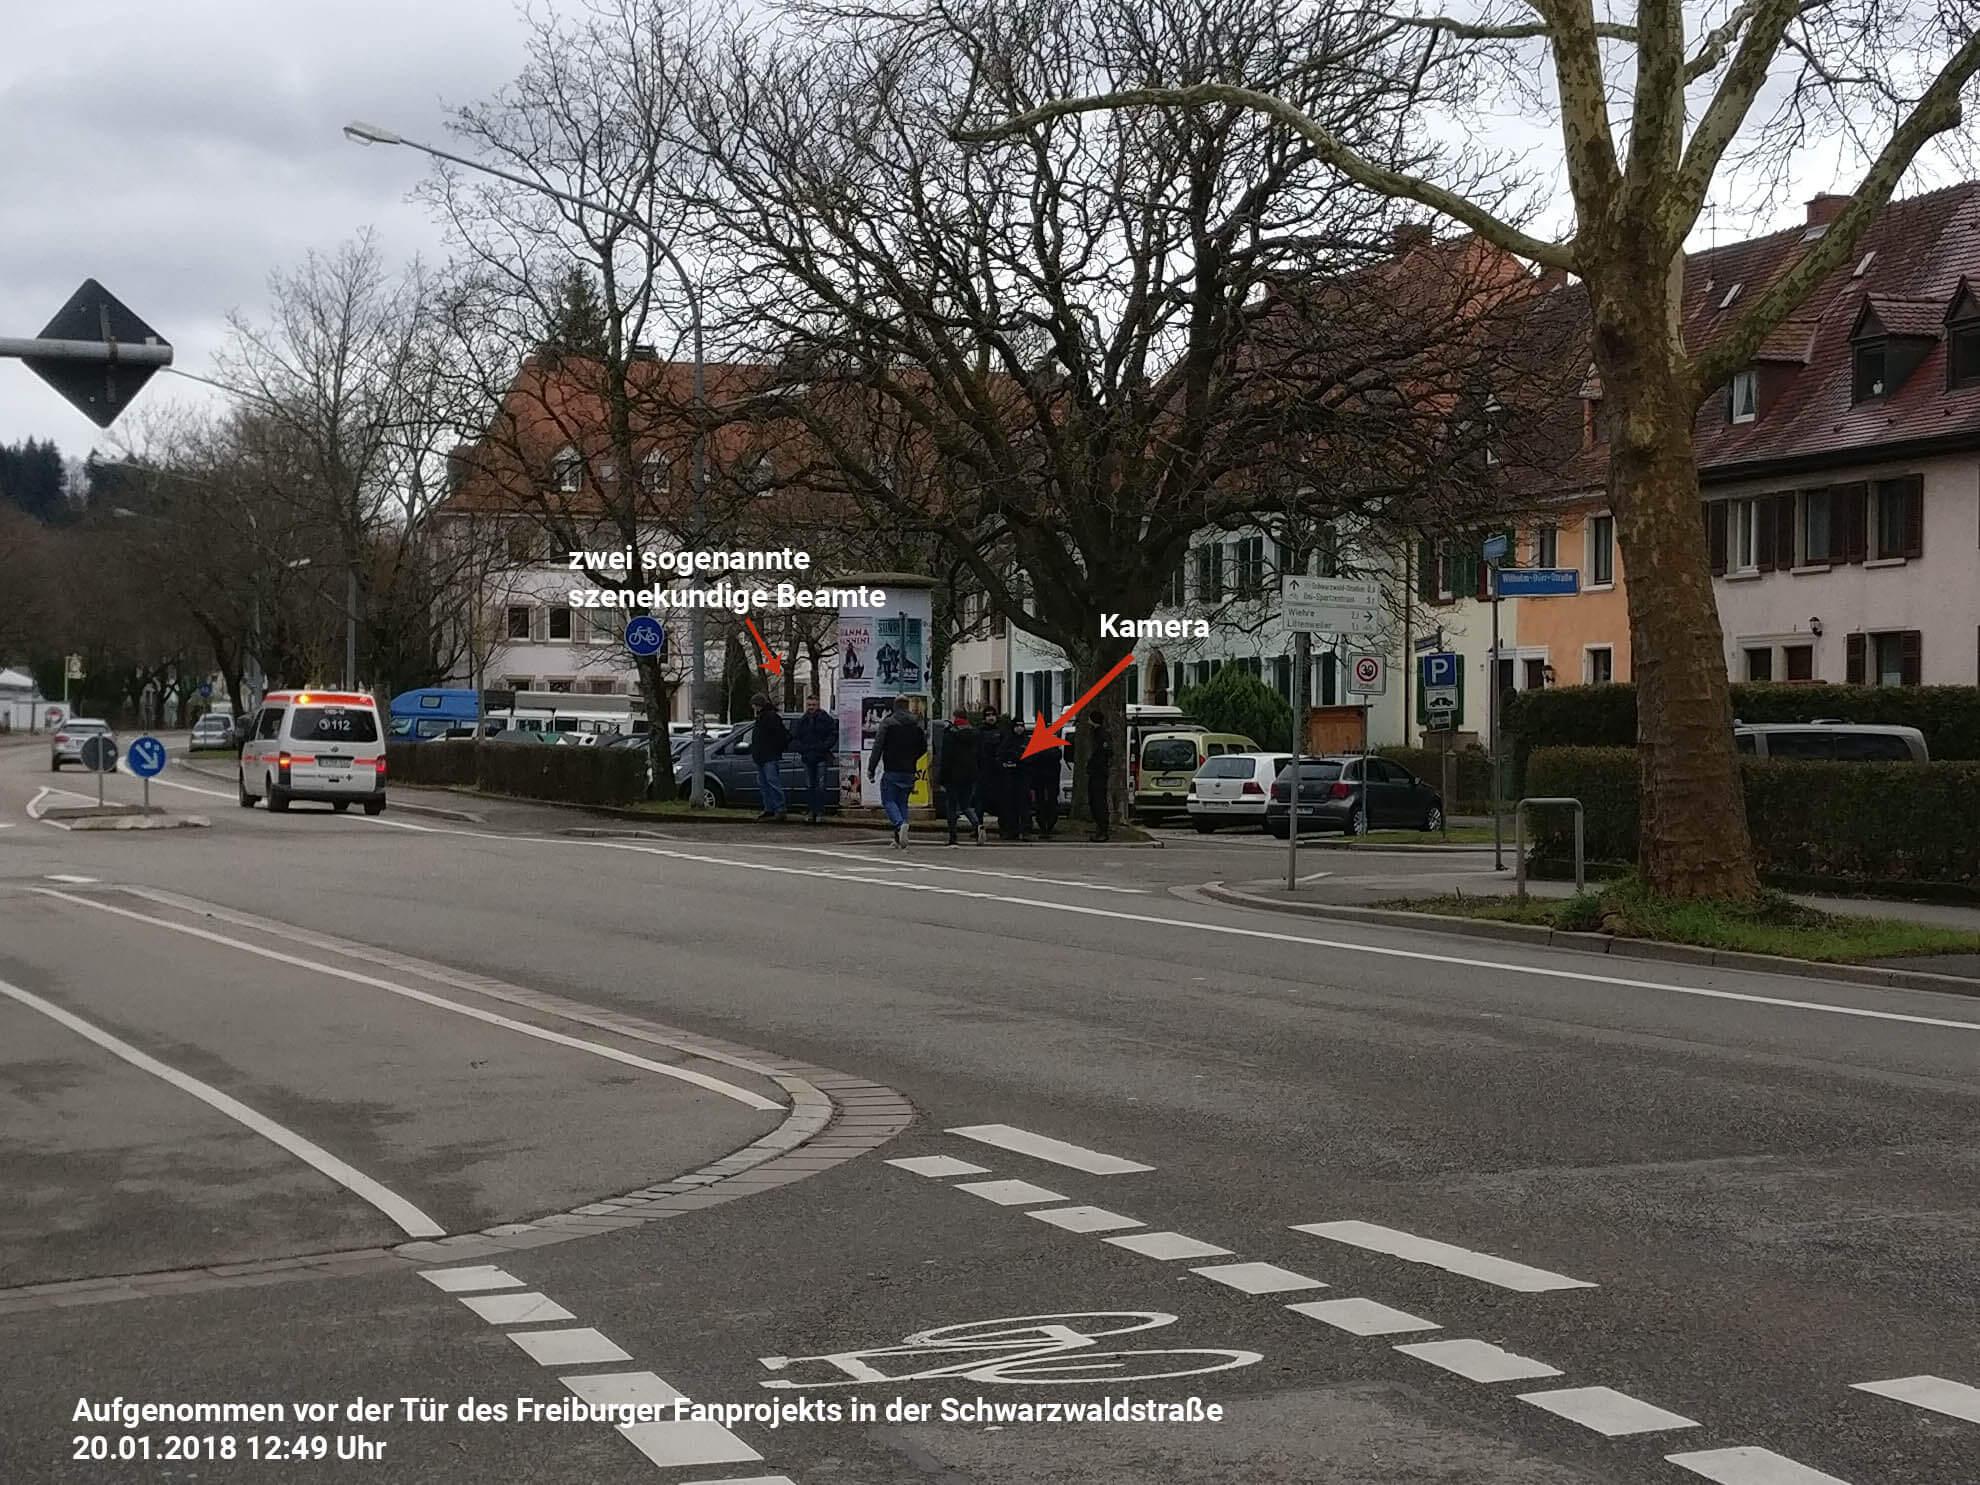 Polizei Freiburg überwacht Fanprojekt